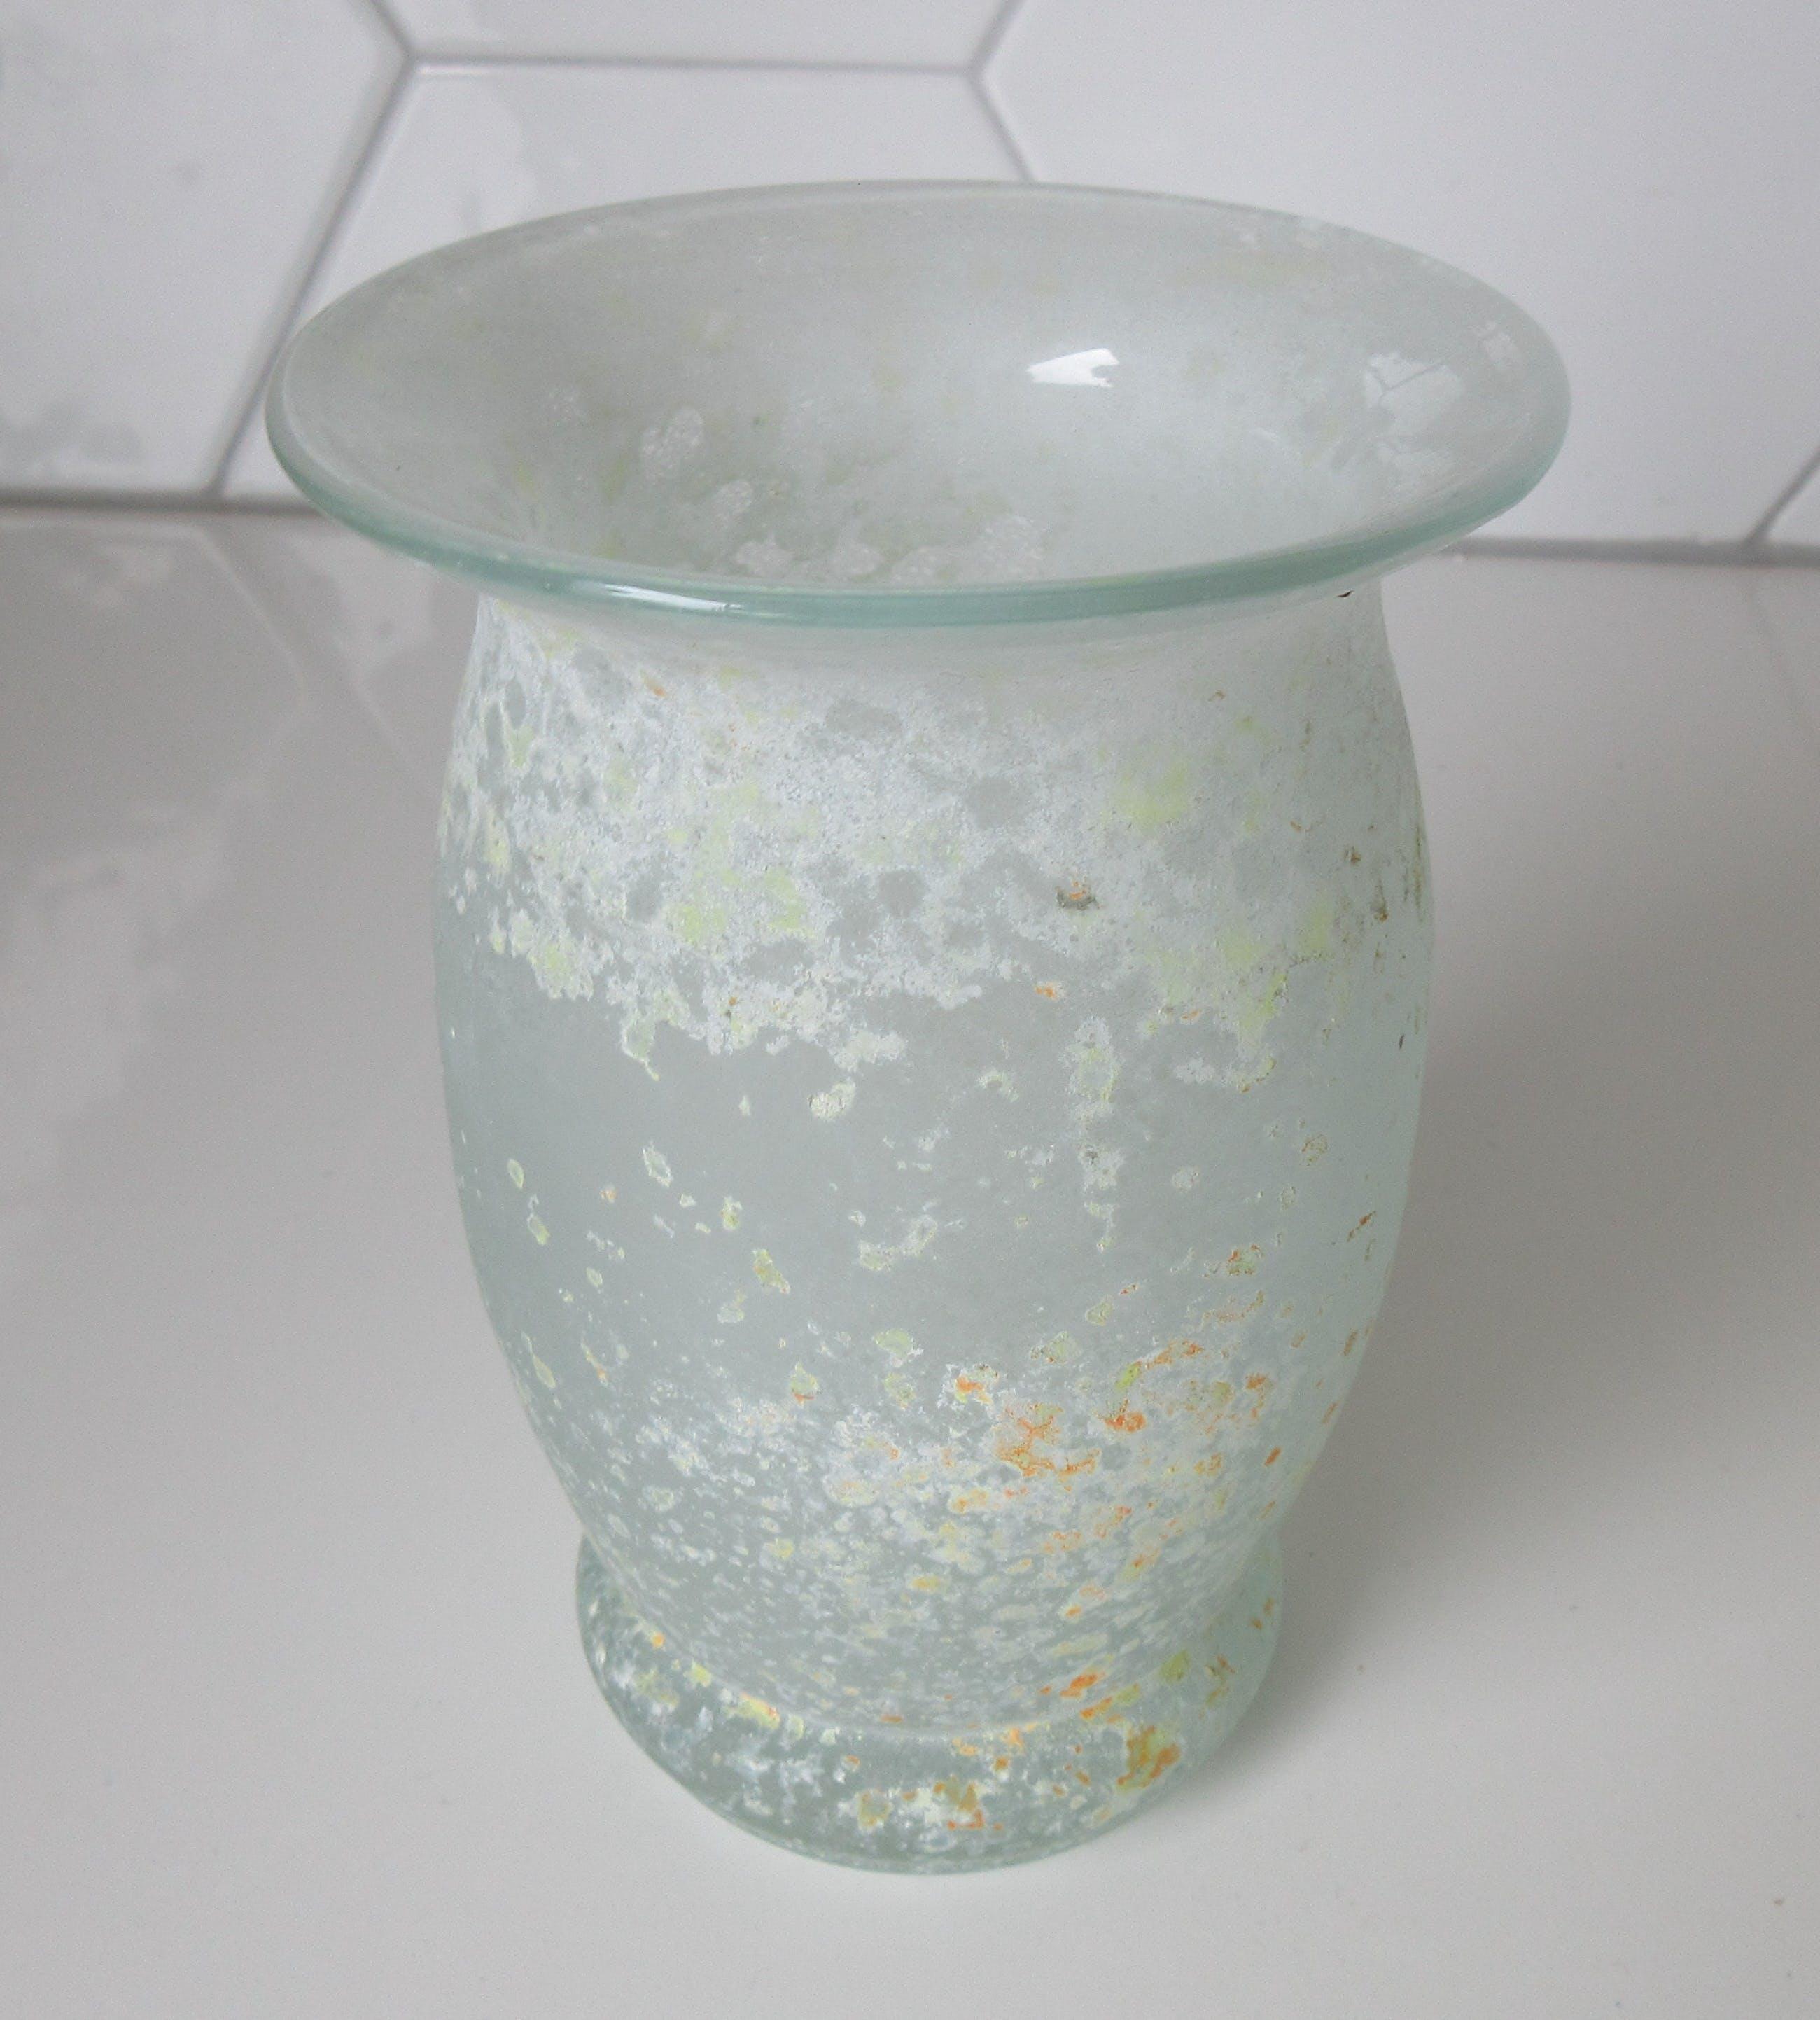 Seguso - Blank glazen Scavo vaas kopen? Bied vanaf 1!